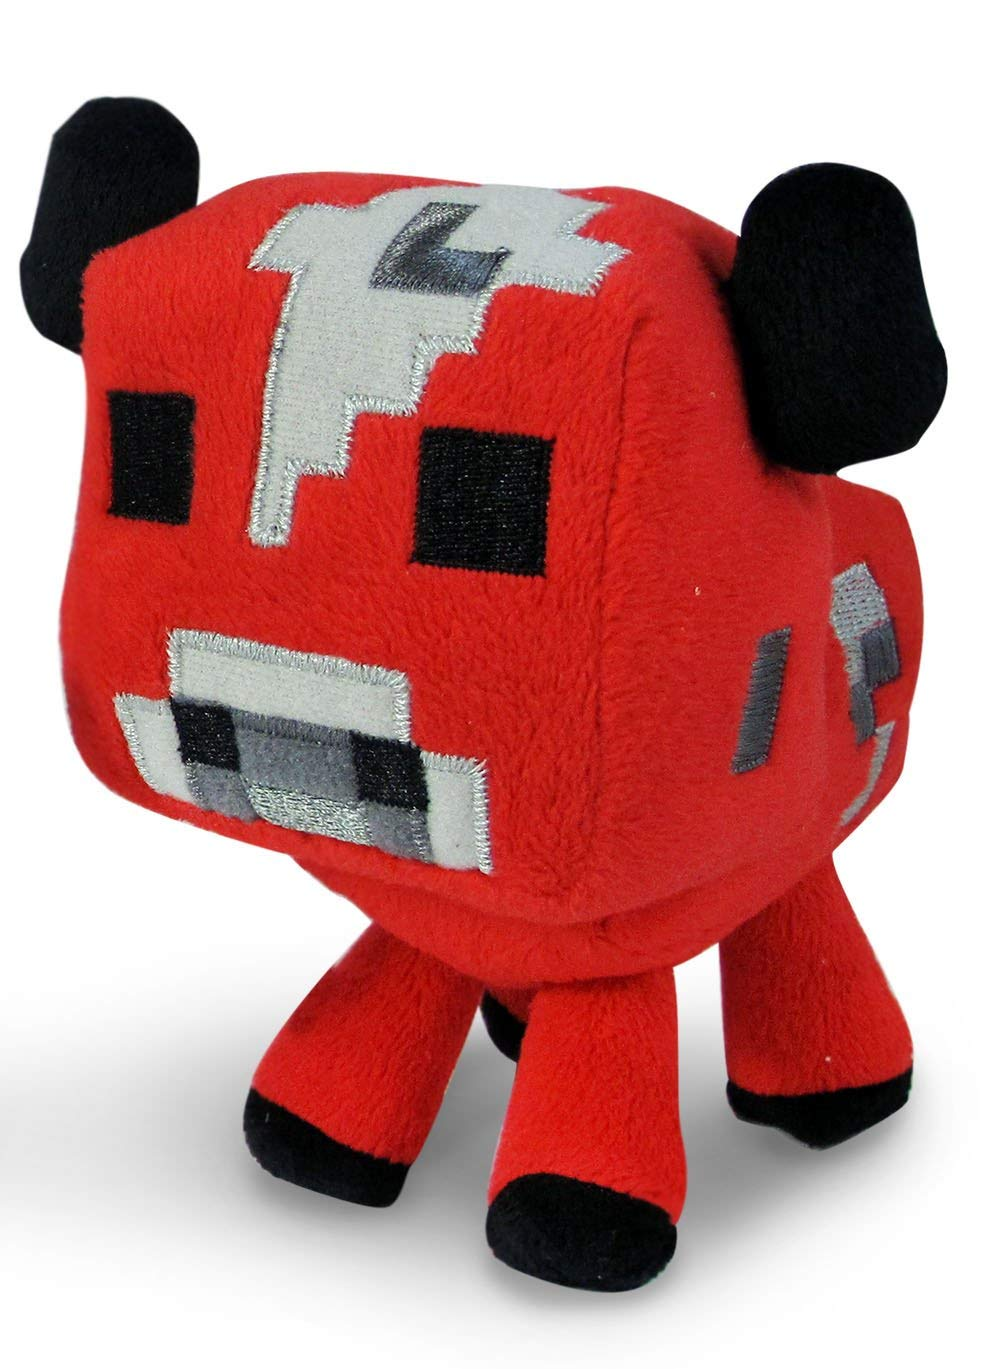 Original Minecraft - Plüsch Figur Stofftier 15-25 cm | Creeper Enderman usw. Baby Pilzkuh